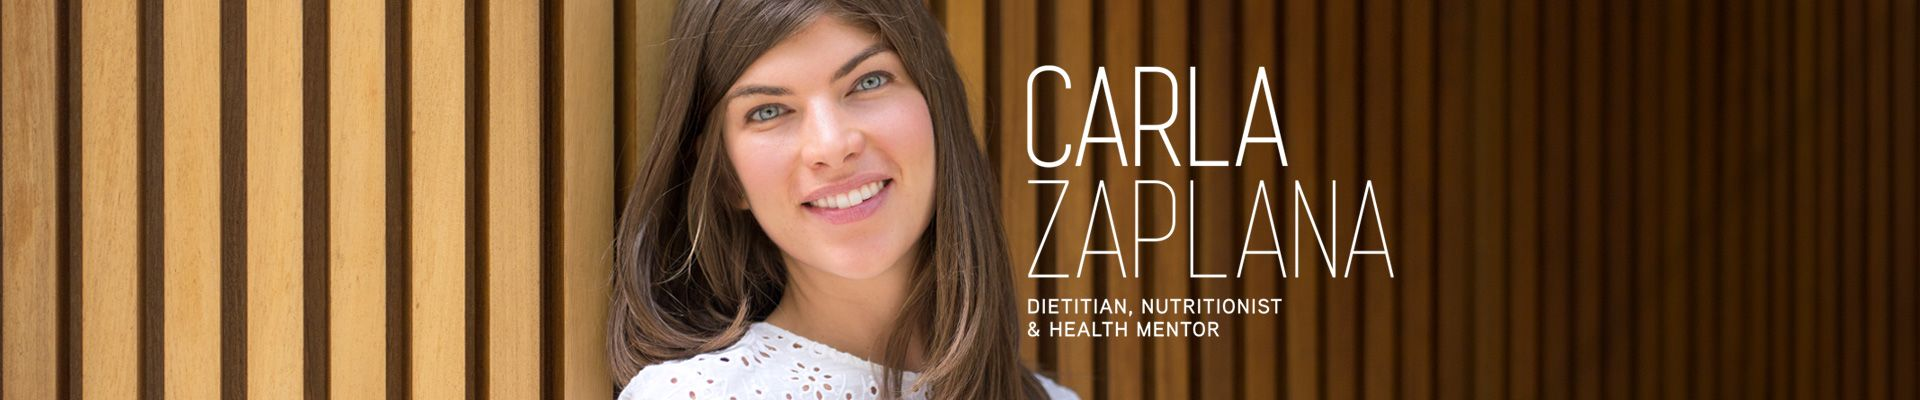 CARLA-ZAPLANA-CABECERA-2016